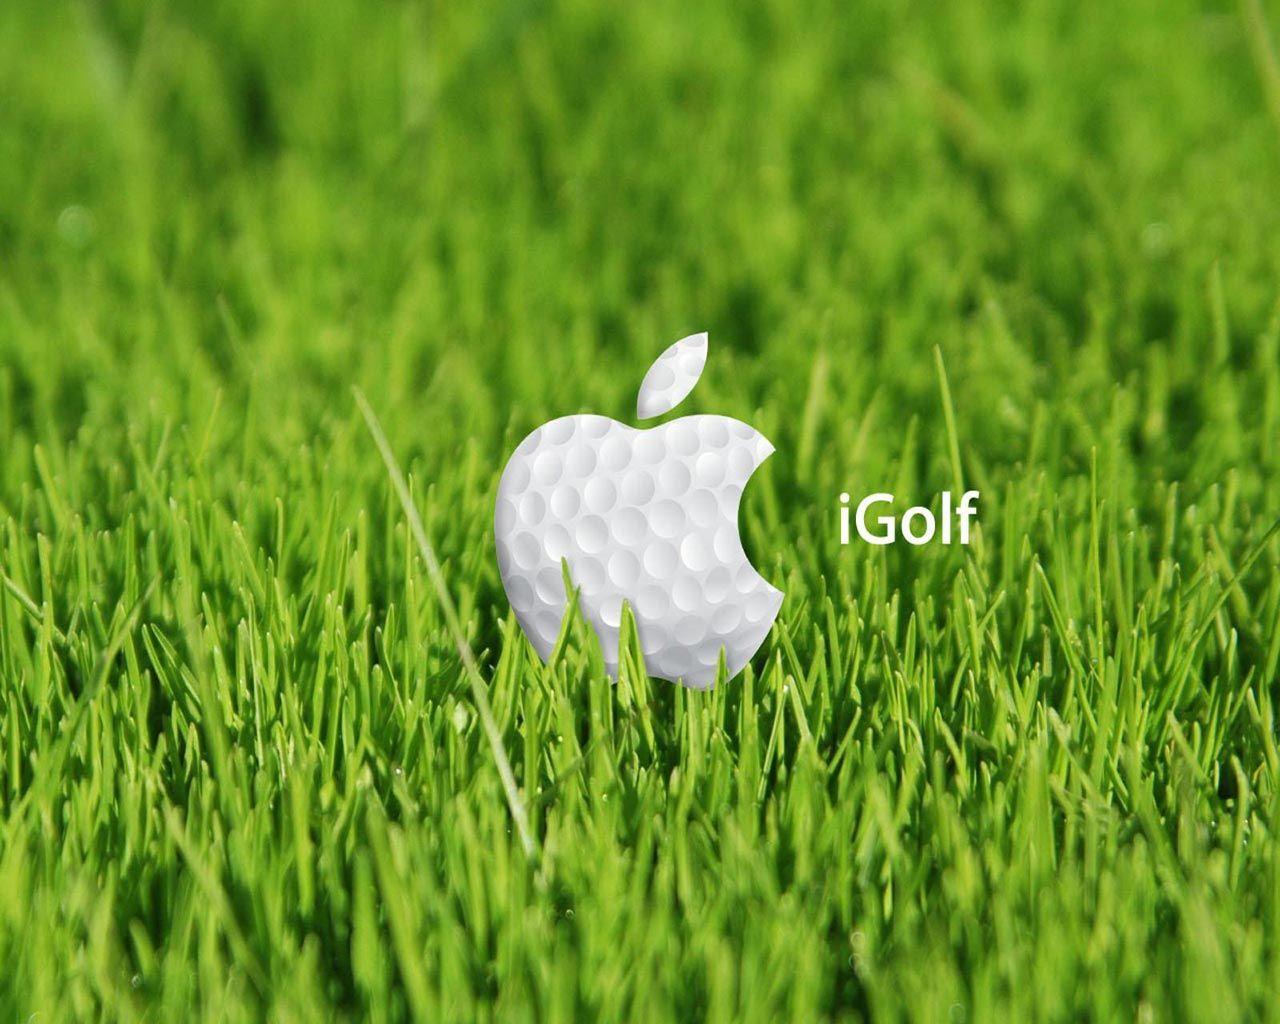 Pin By 天音 On Detours Golf Ball Golf Humor Golf